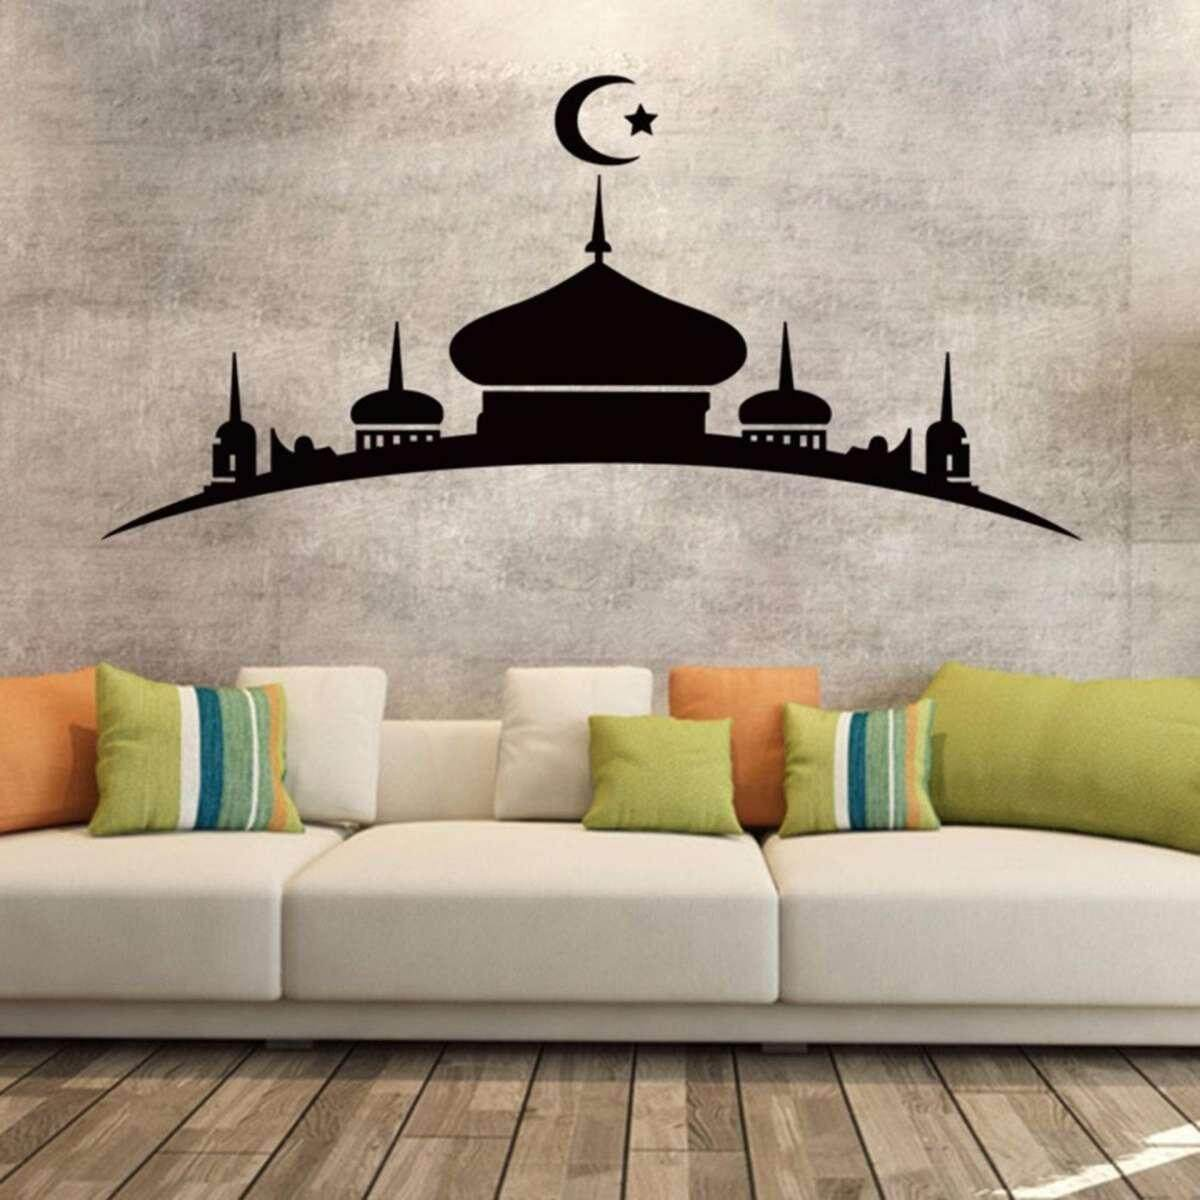 (MALAYSIAN SELLER) Islam Wall Sticker Islamic Art Sticker Removable Arabic Arabian Allah Malay Melayu Nabi Muhammad Mosque Syahadah Sticker Vinyl Home Decor Home Deco Decal MANY DESIGN INSIDE (FREE RM 50 VOUCHER)